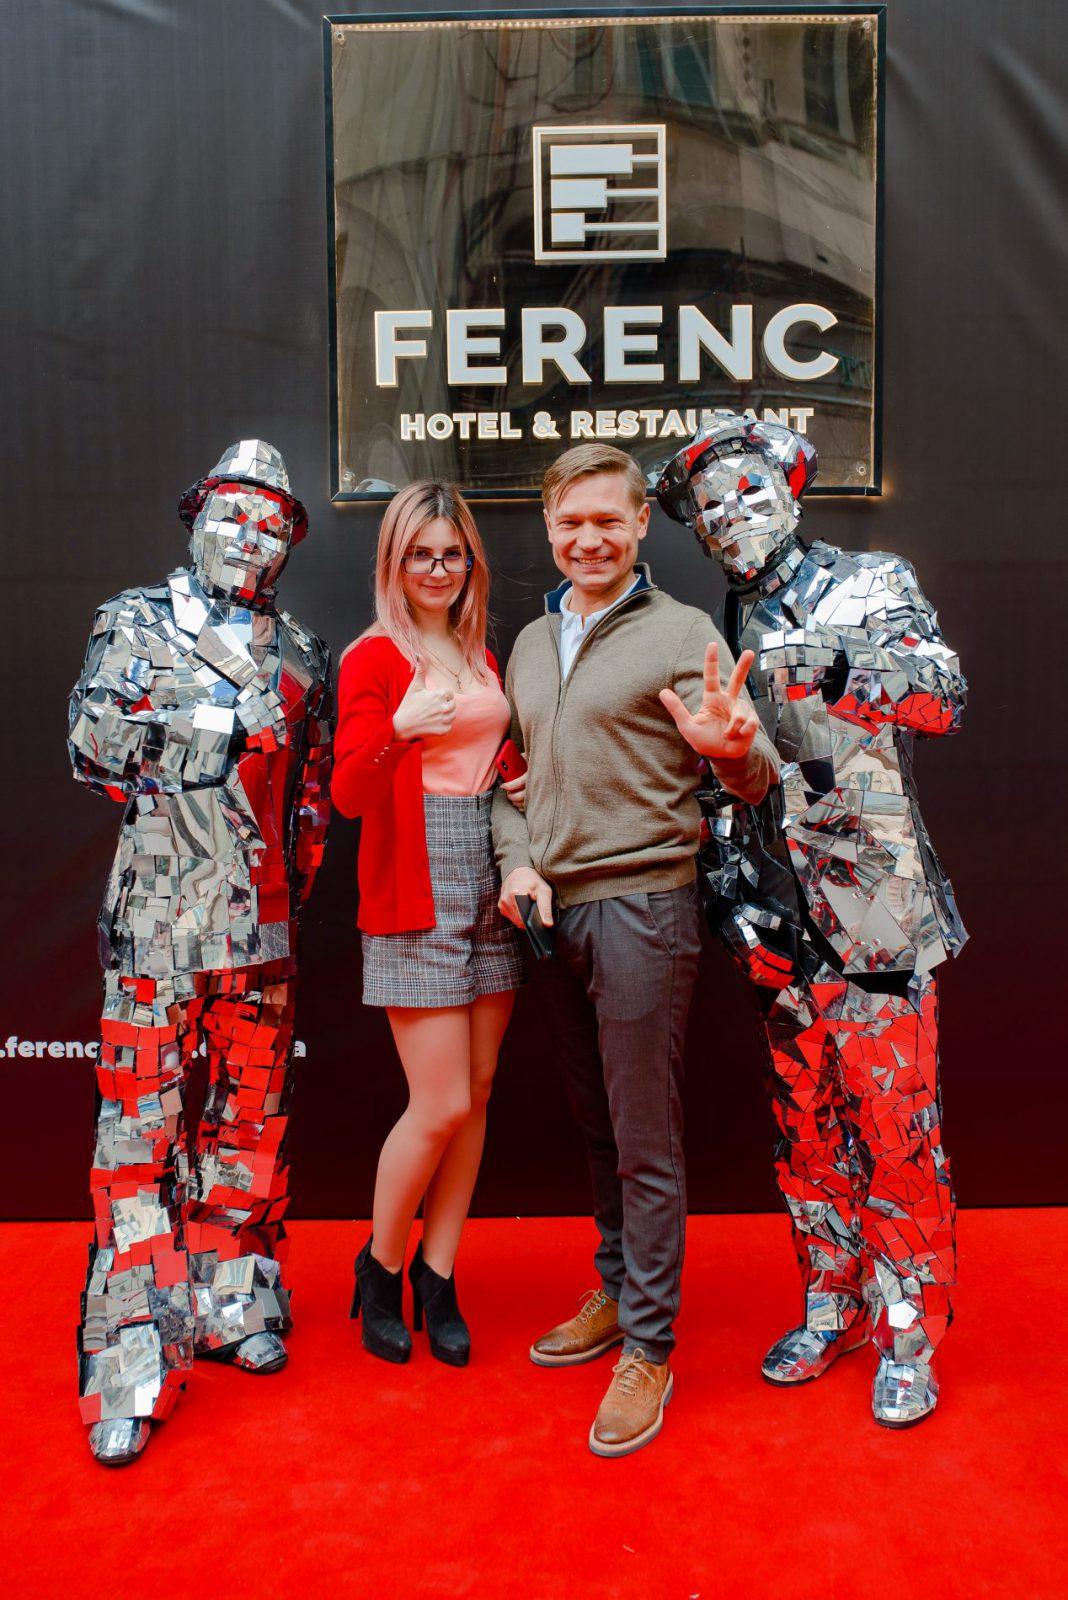 Ferenc0102